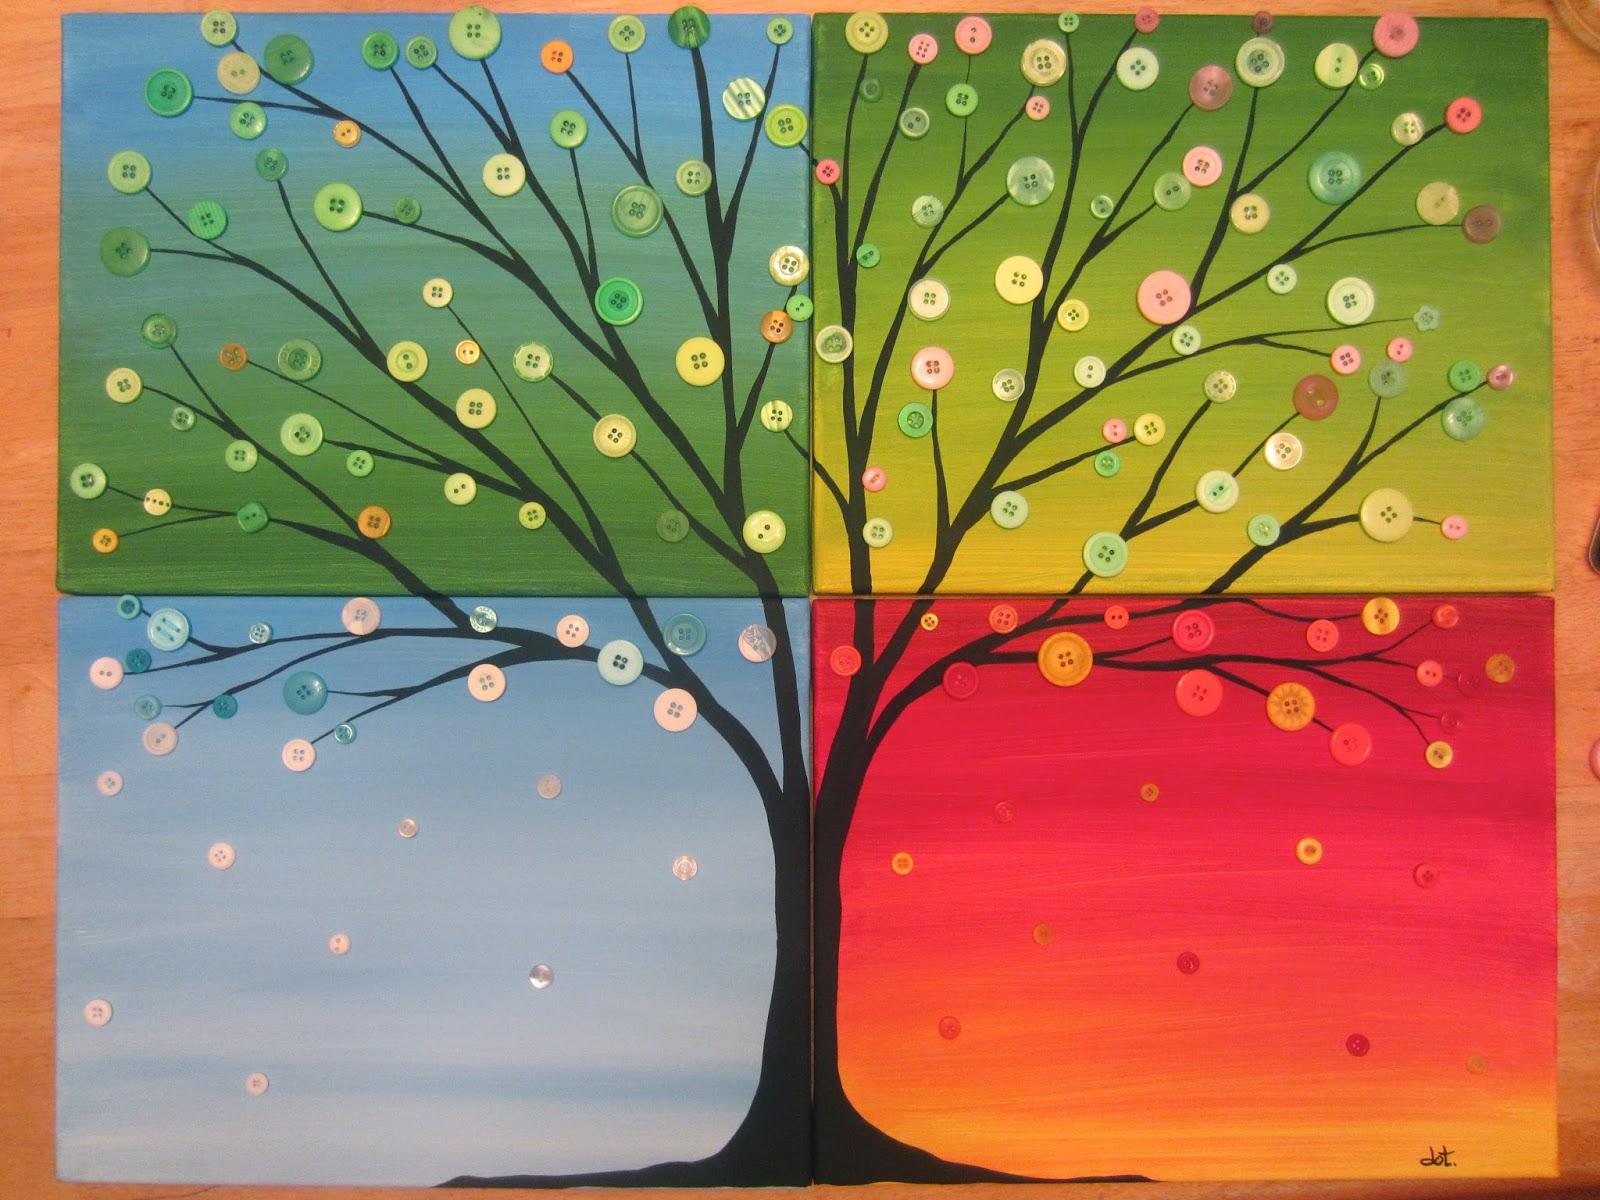 art four seasons tree 365 days of happiness group art